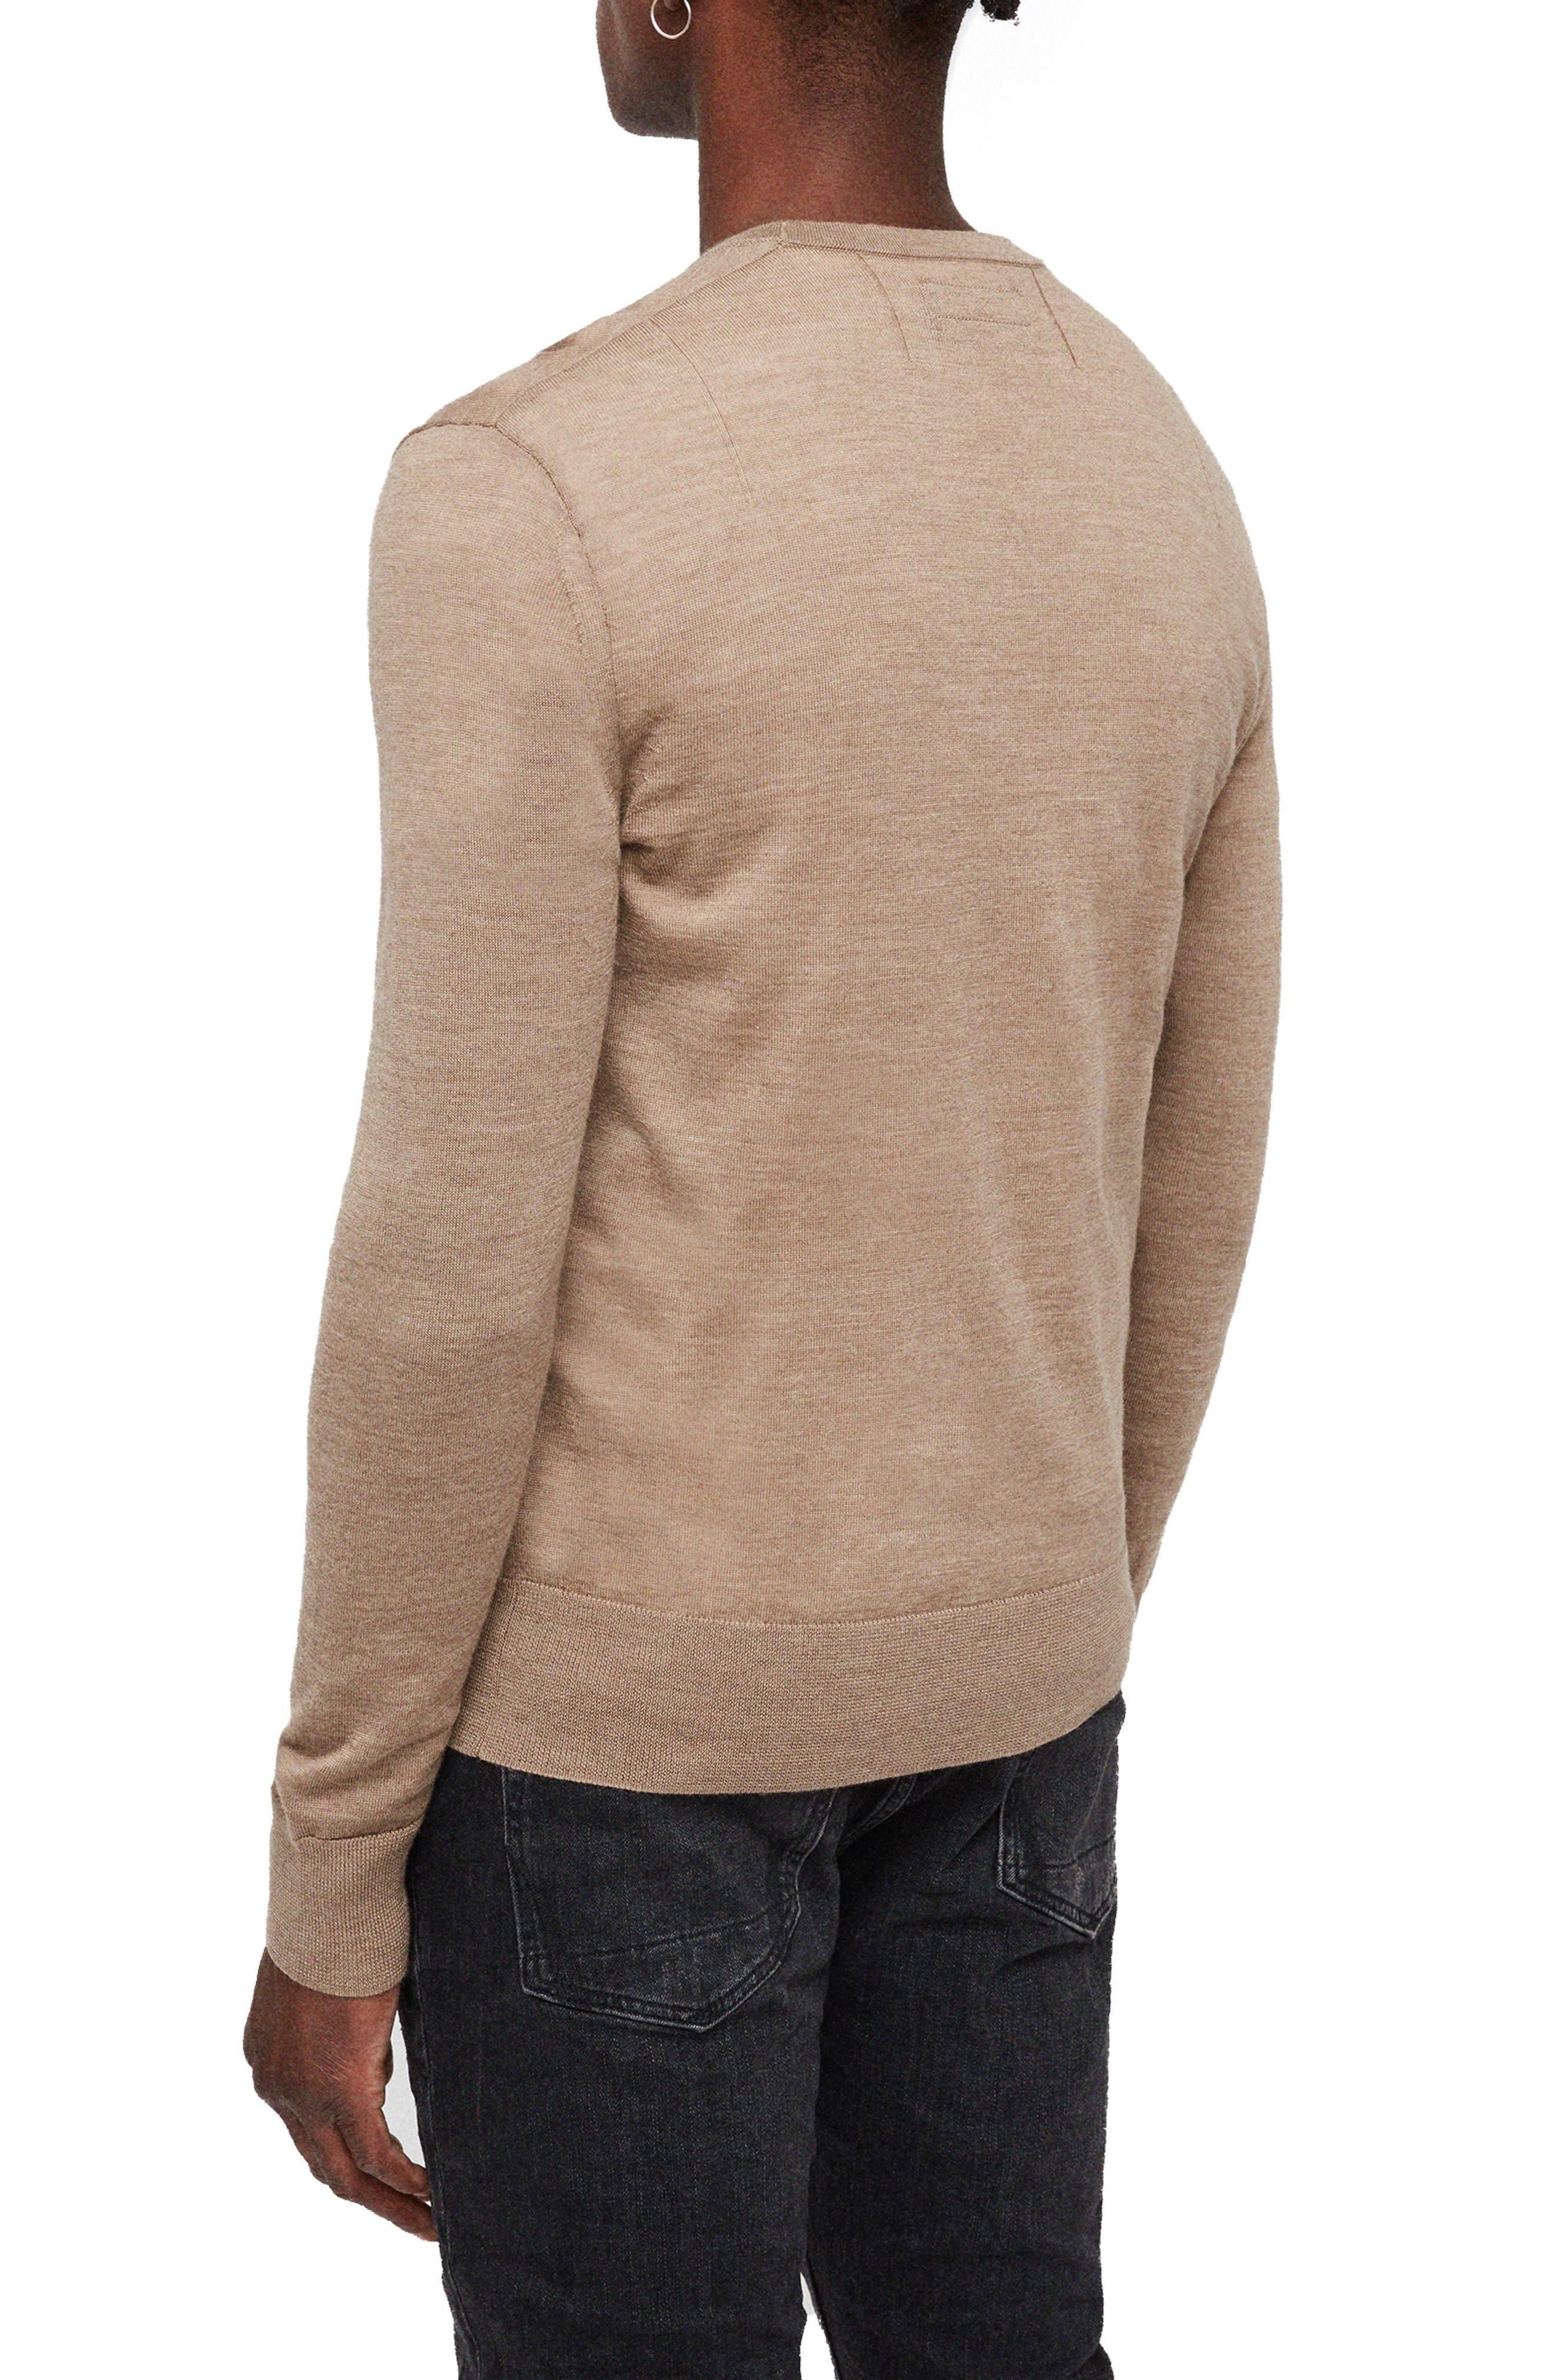 Mode Slim Fit Merino Wool Sweater,                             Alternate thumbnail 12, color,